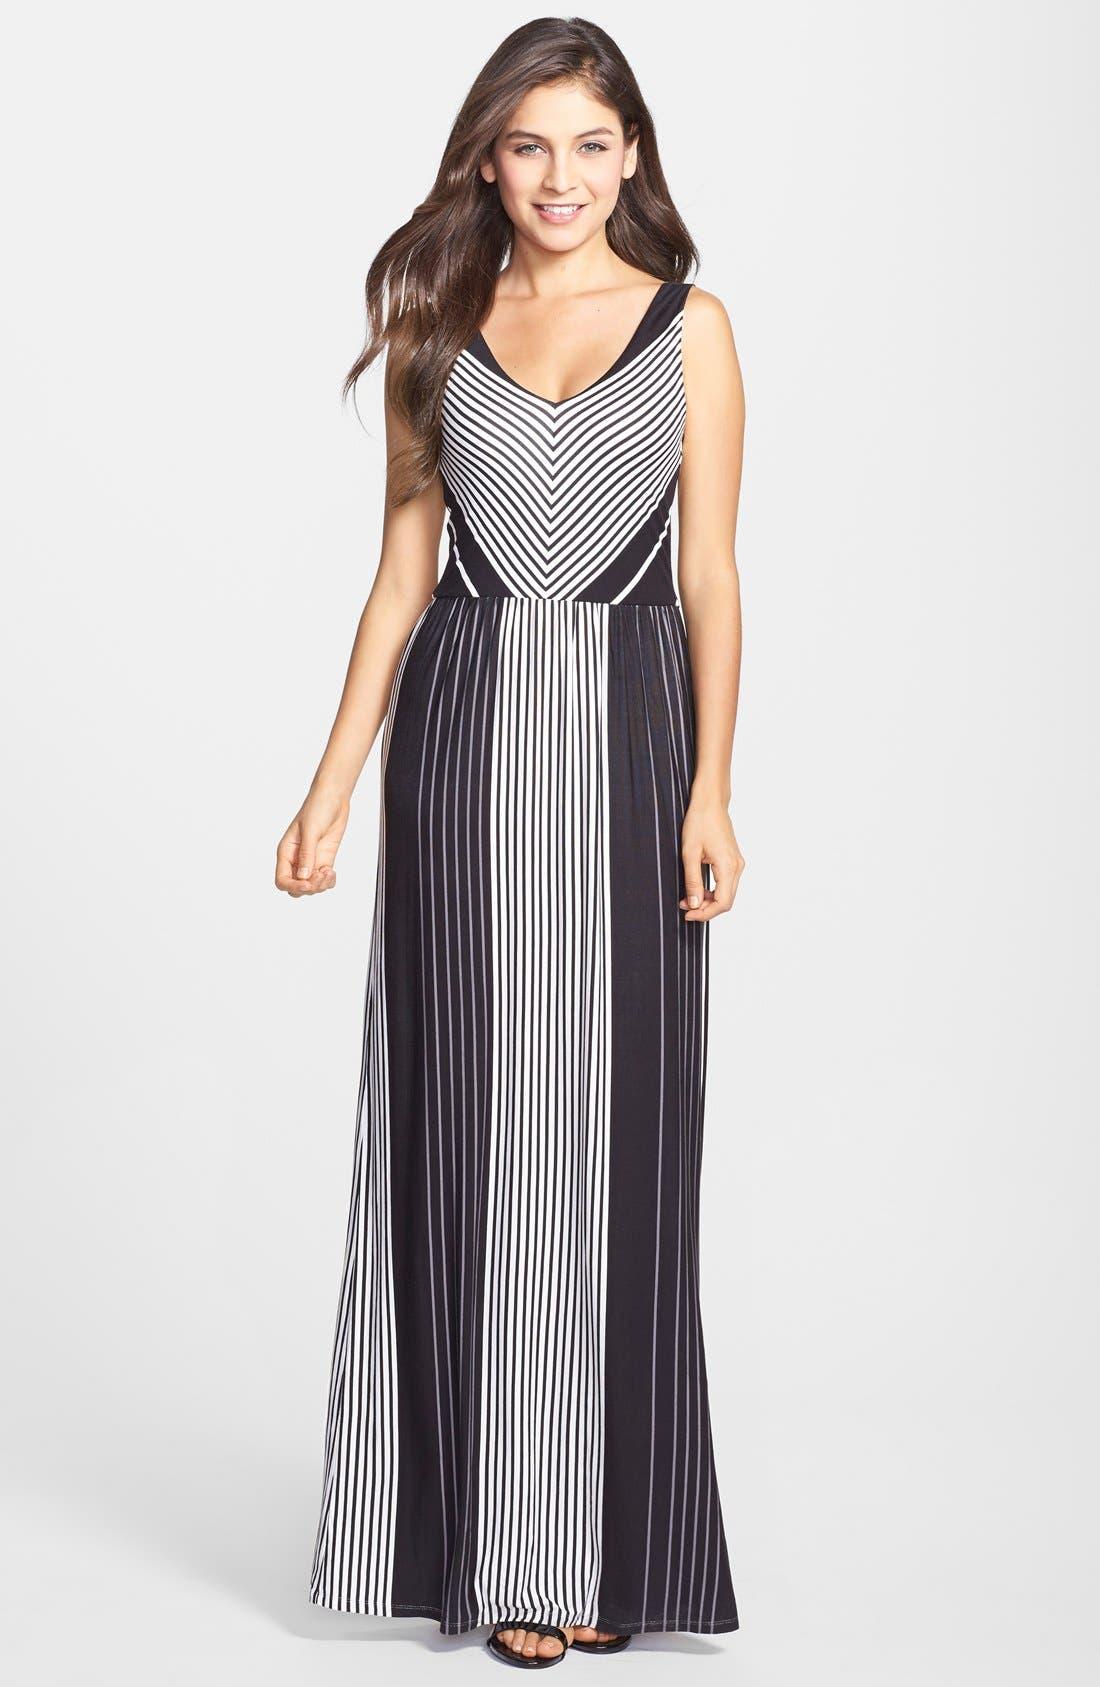 Main Image - Felicity & Coco Stripe V-Neck Maxi Dress (Regular & Petite) (Nordstrom Exclusive)